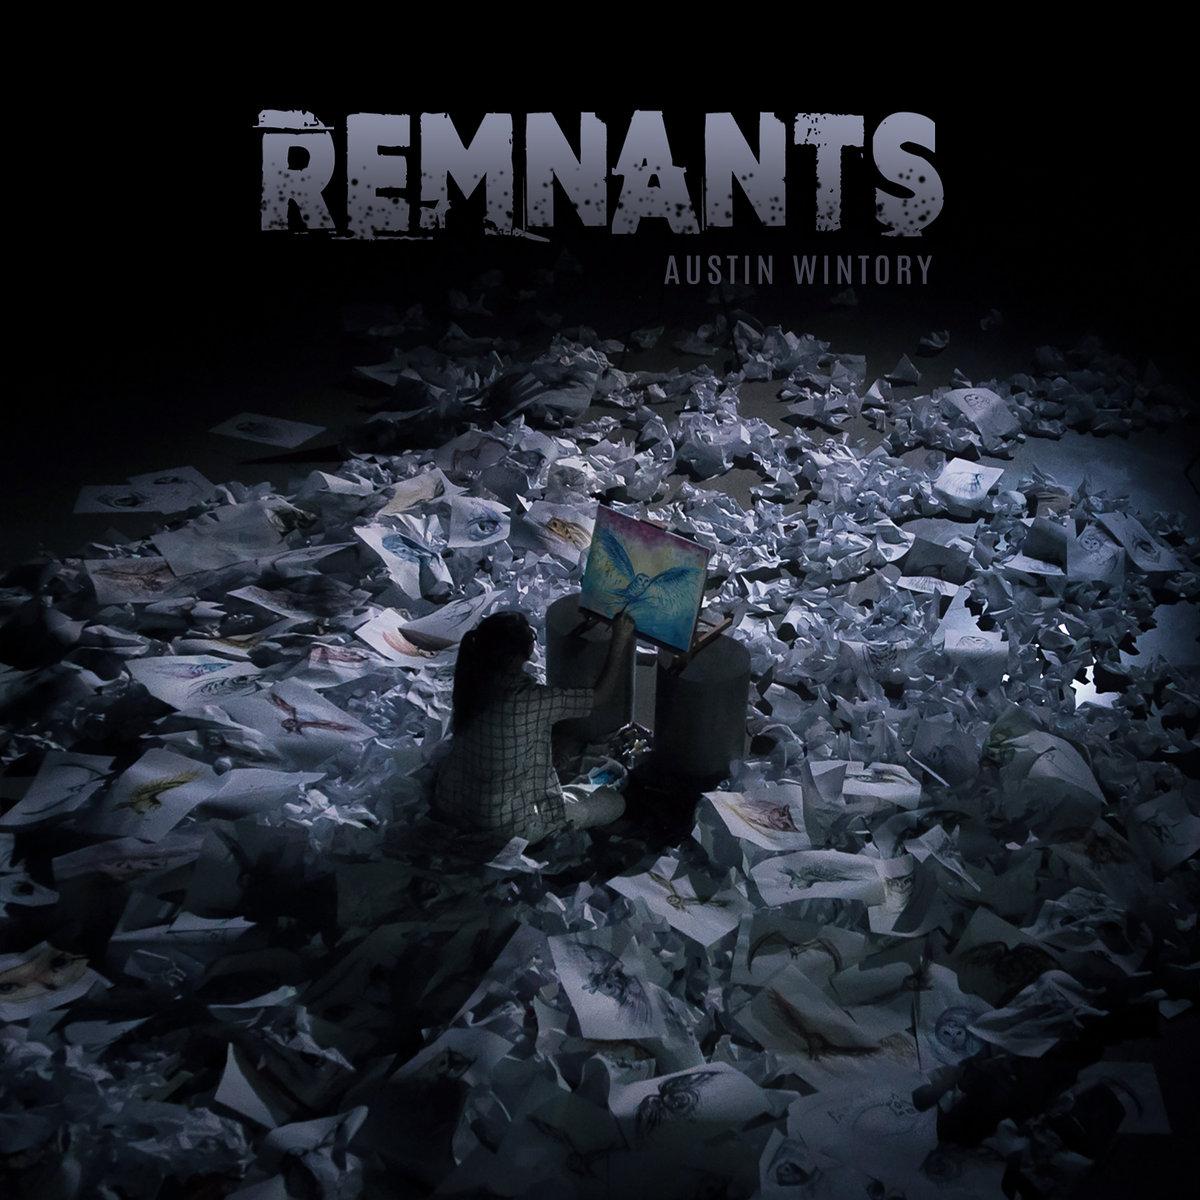 Remnants. Soundtrack From Remnants